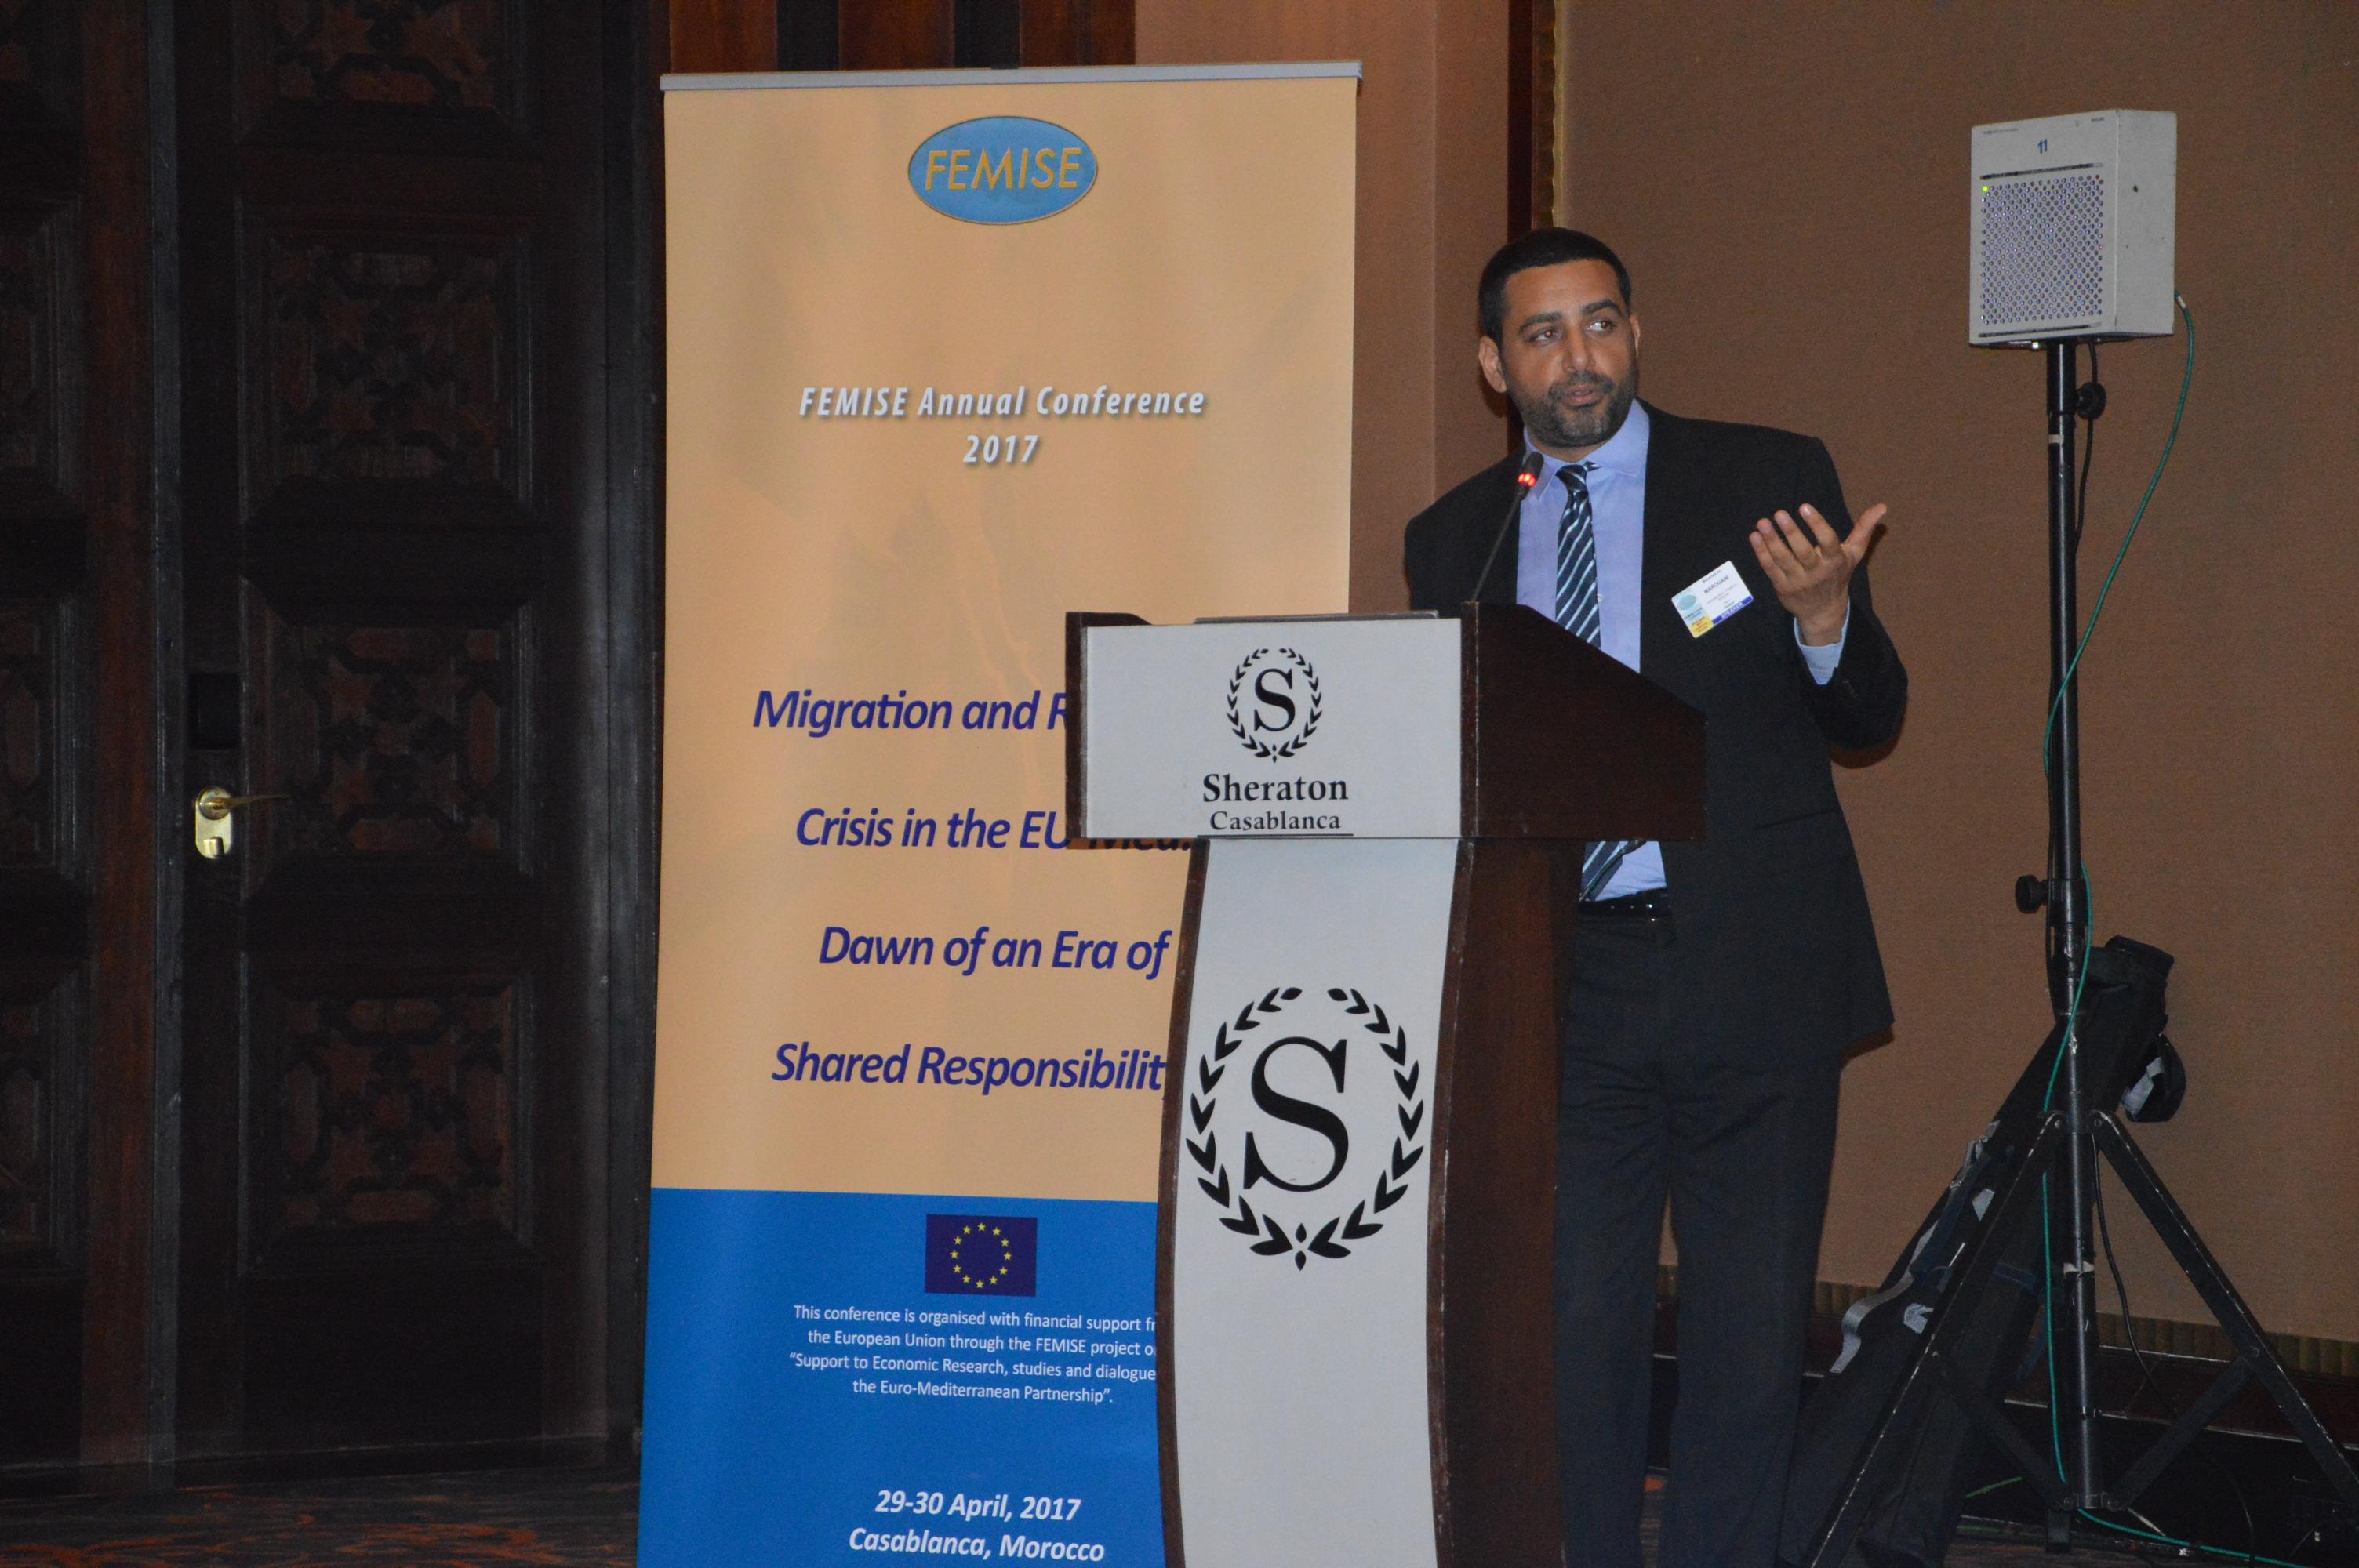 Mohamed Ali Marouani, FEMISE conference 2017